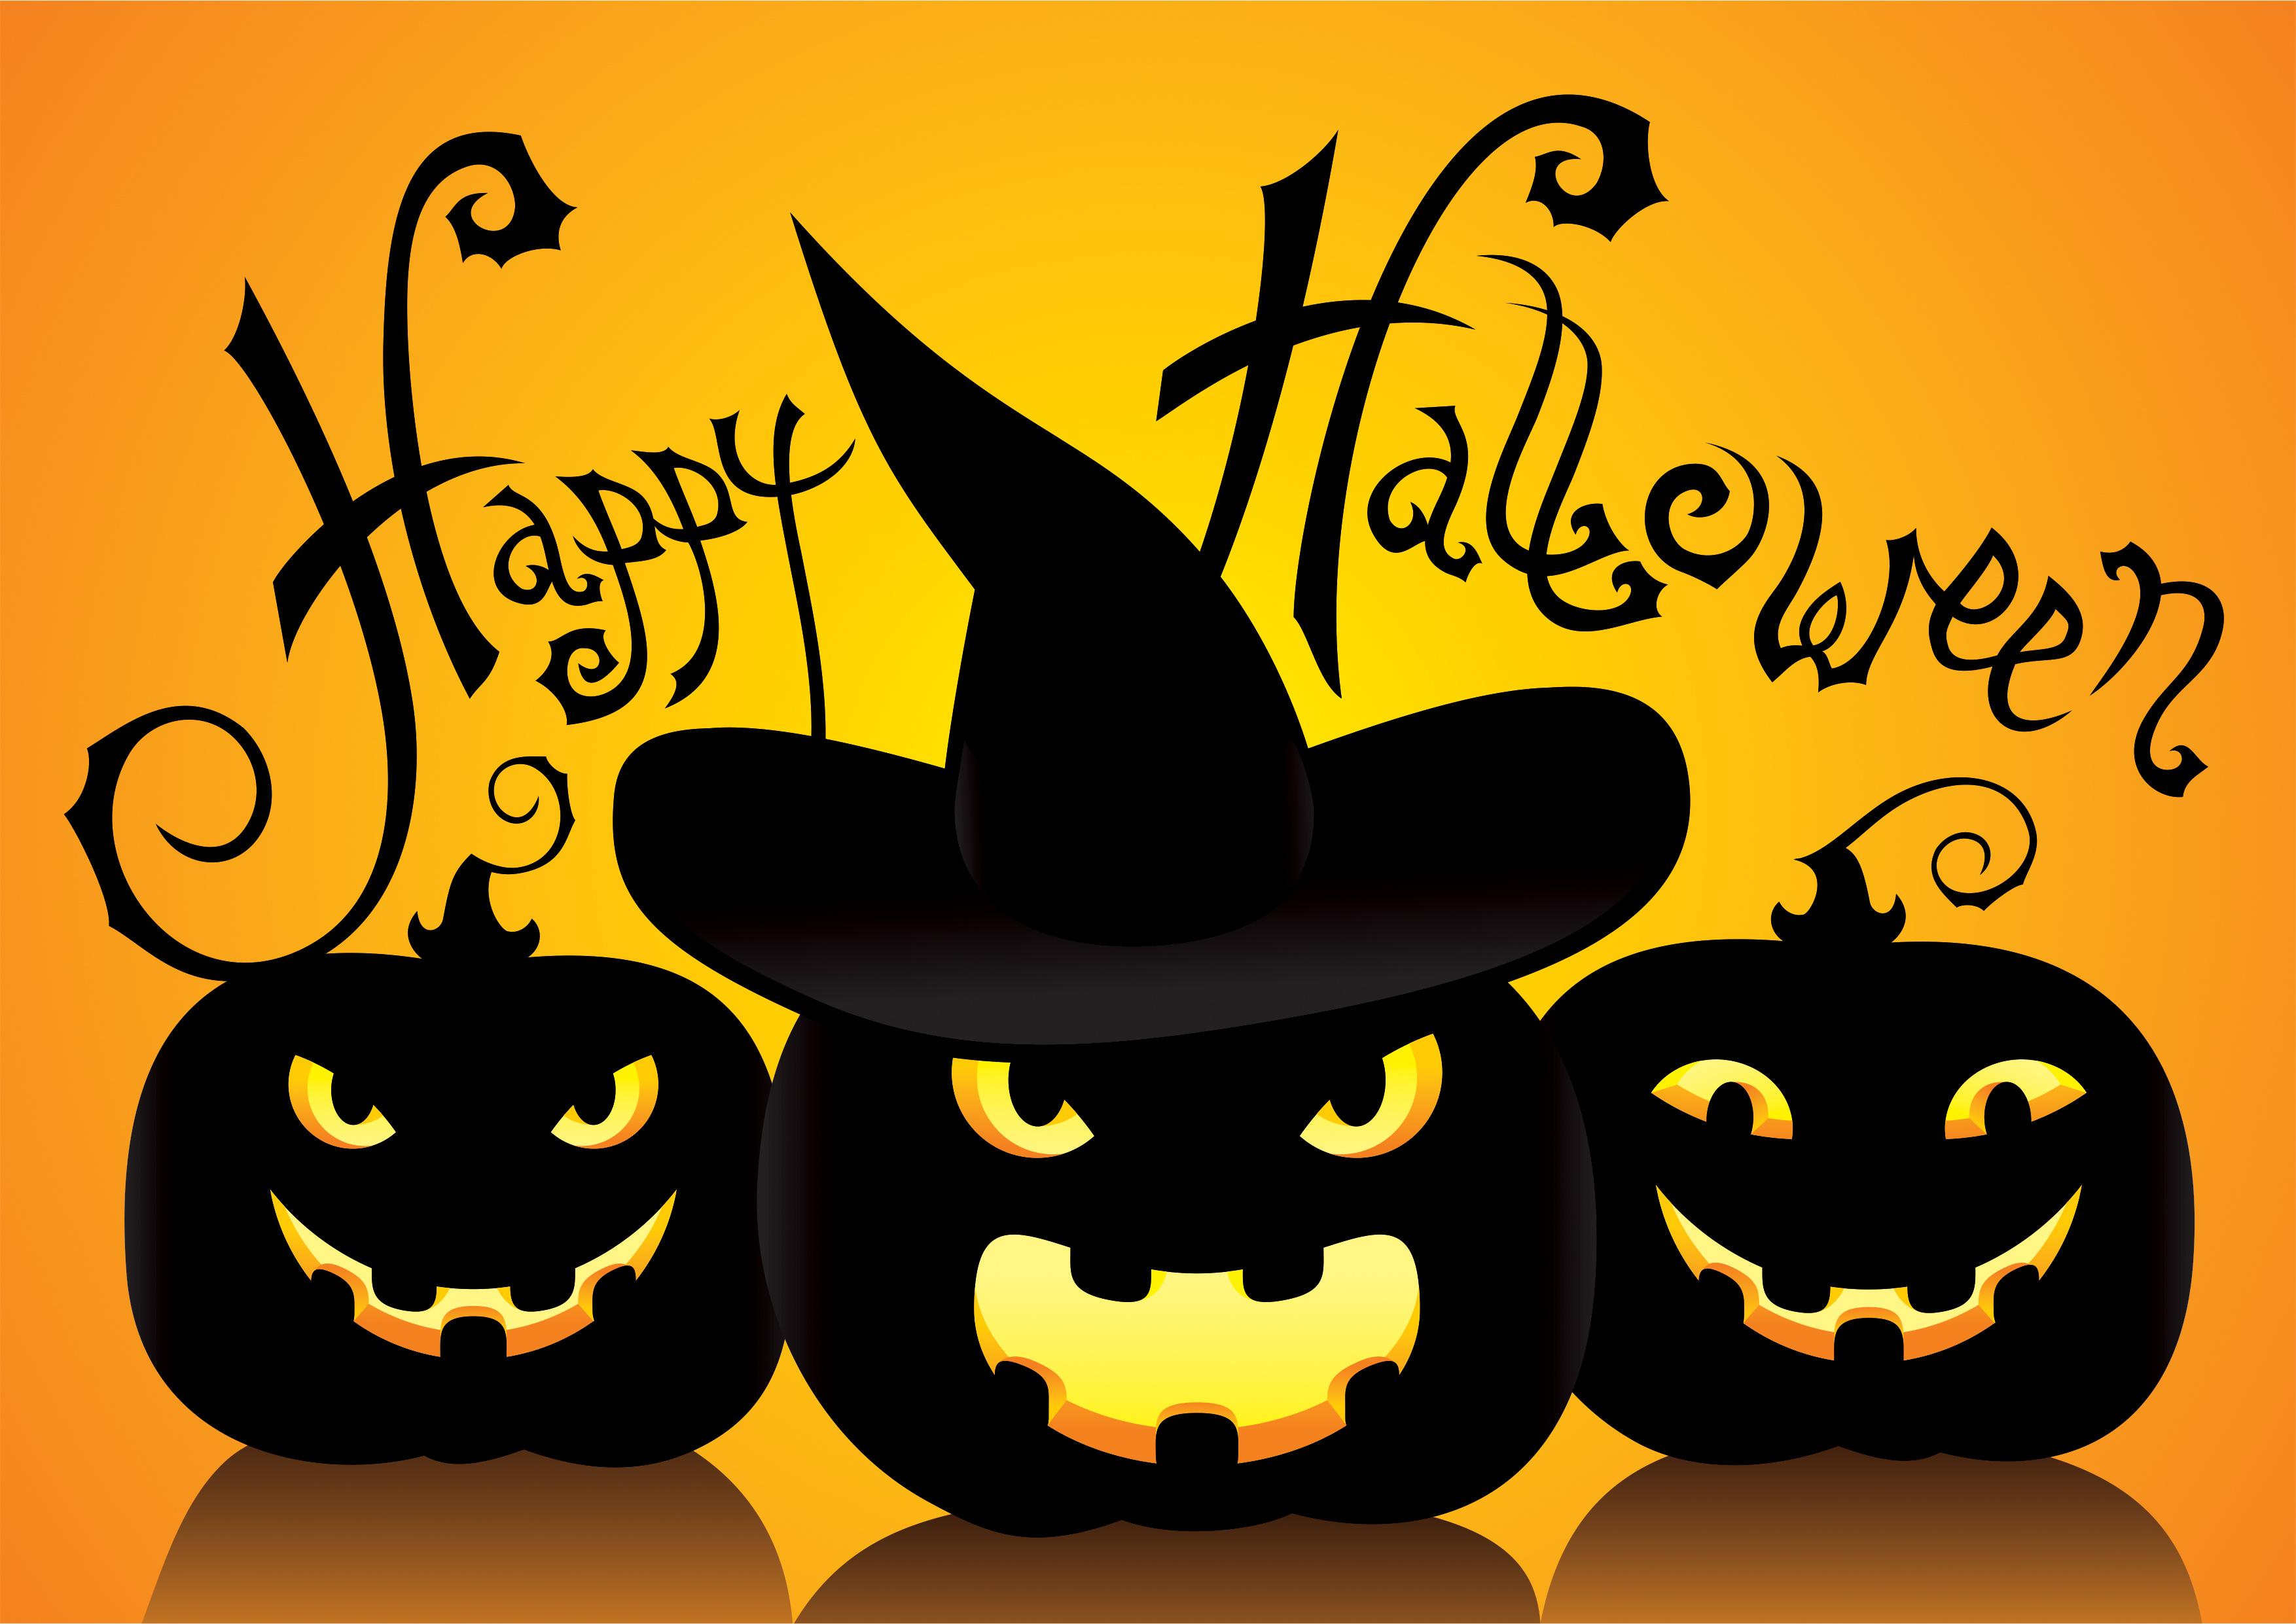 Yalla Kids Wishing You All A Happy Halloween!!!